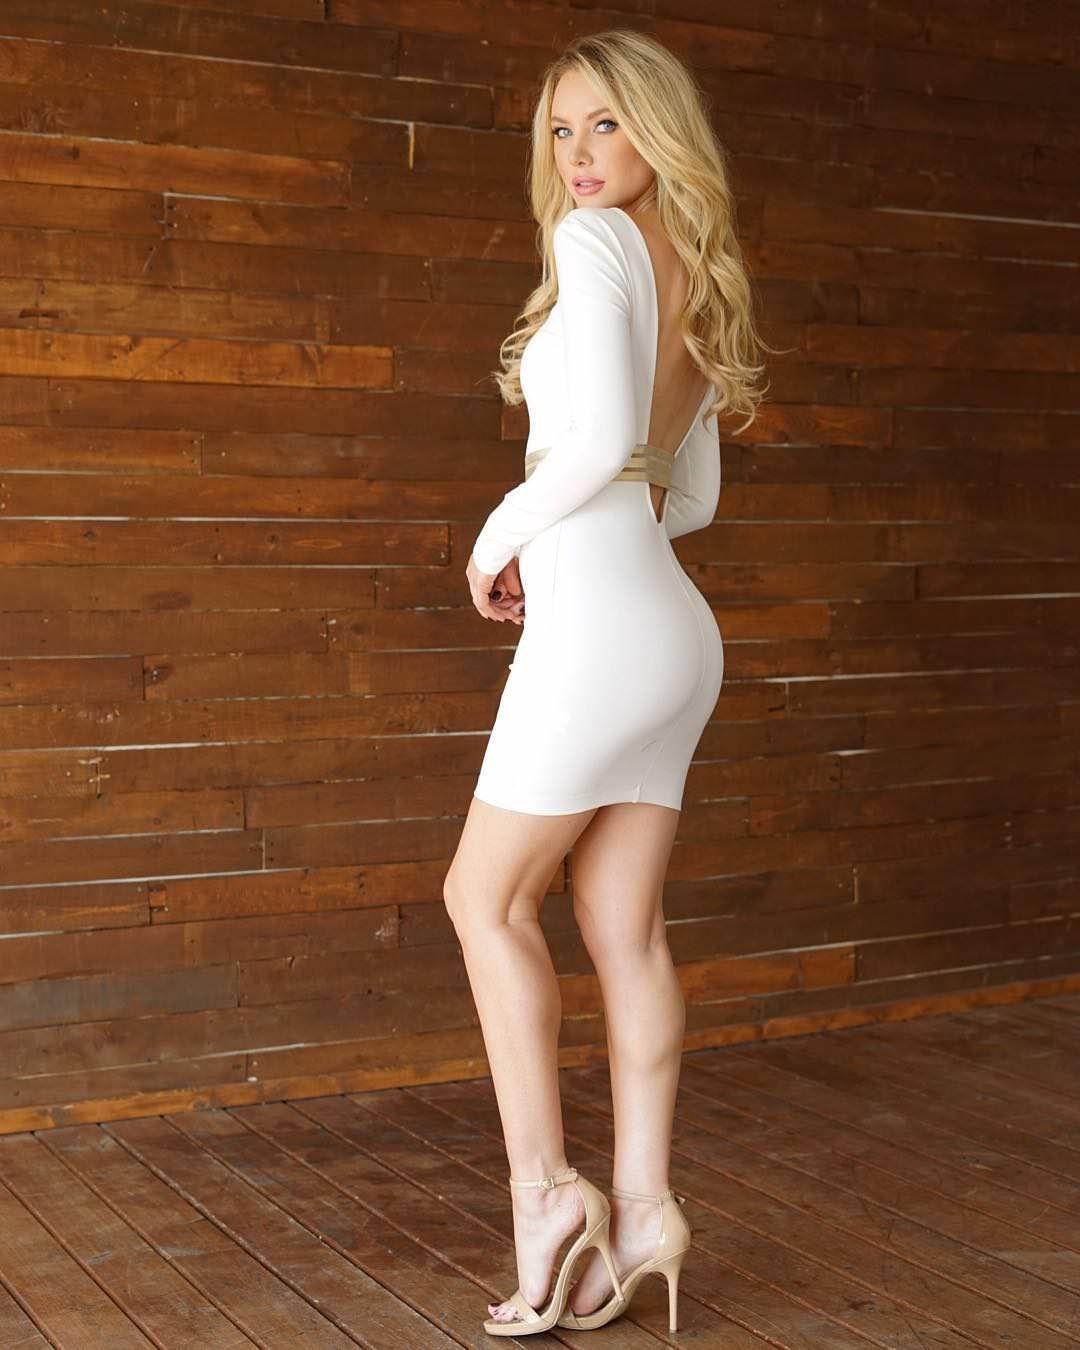 Sexy Blonde Tight Dress Beautiful Adult Stock Photo